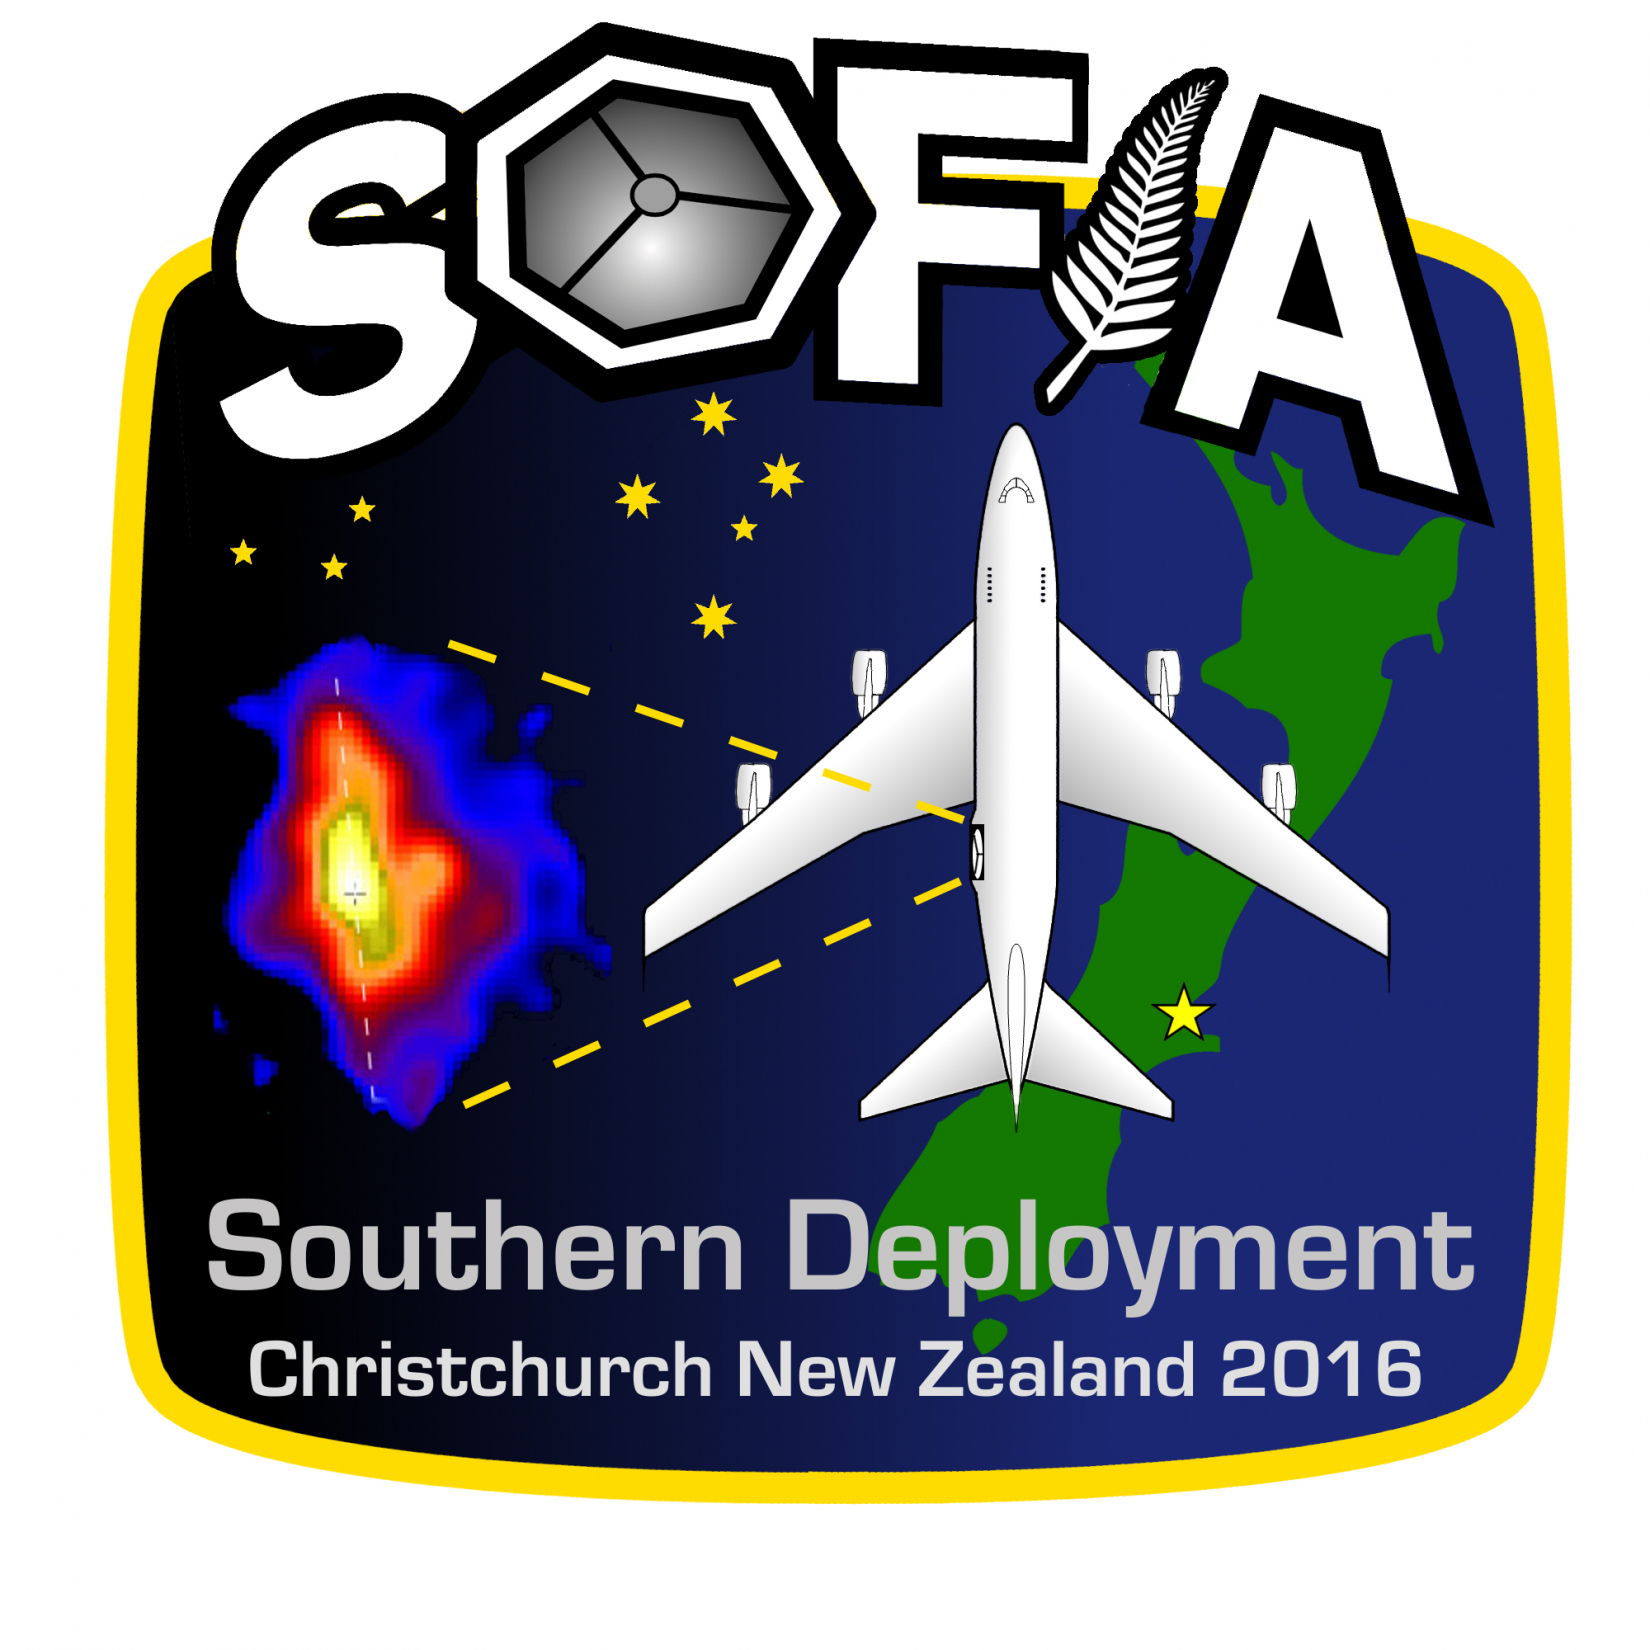 2016 Southern Deployment patch